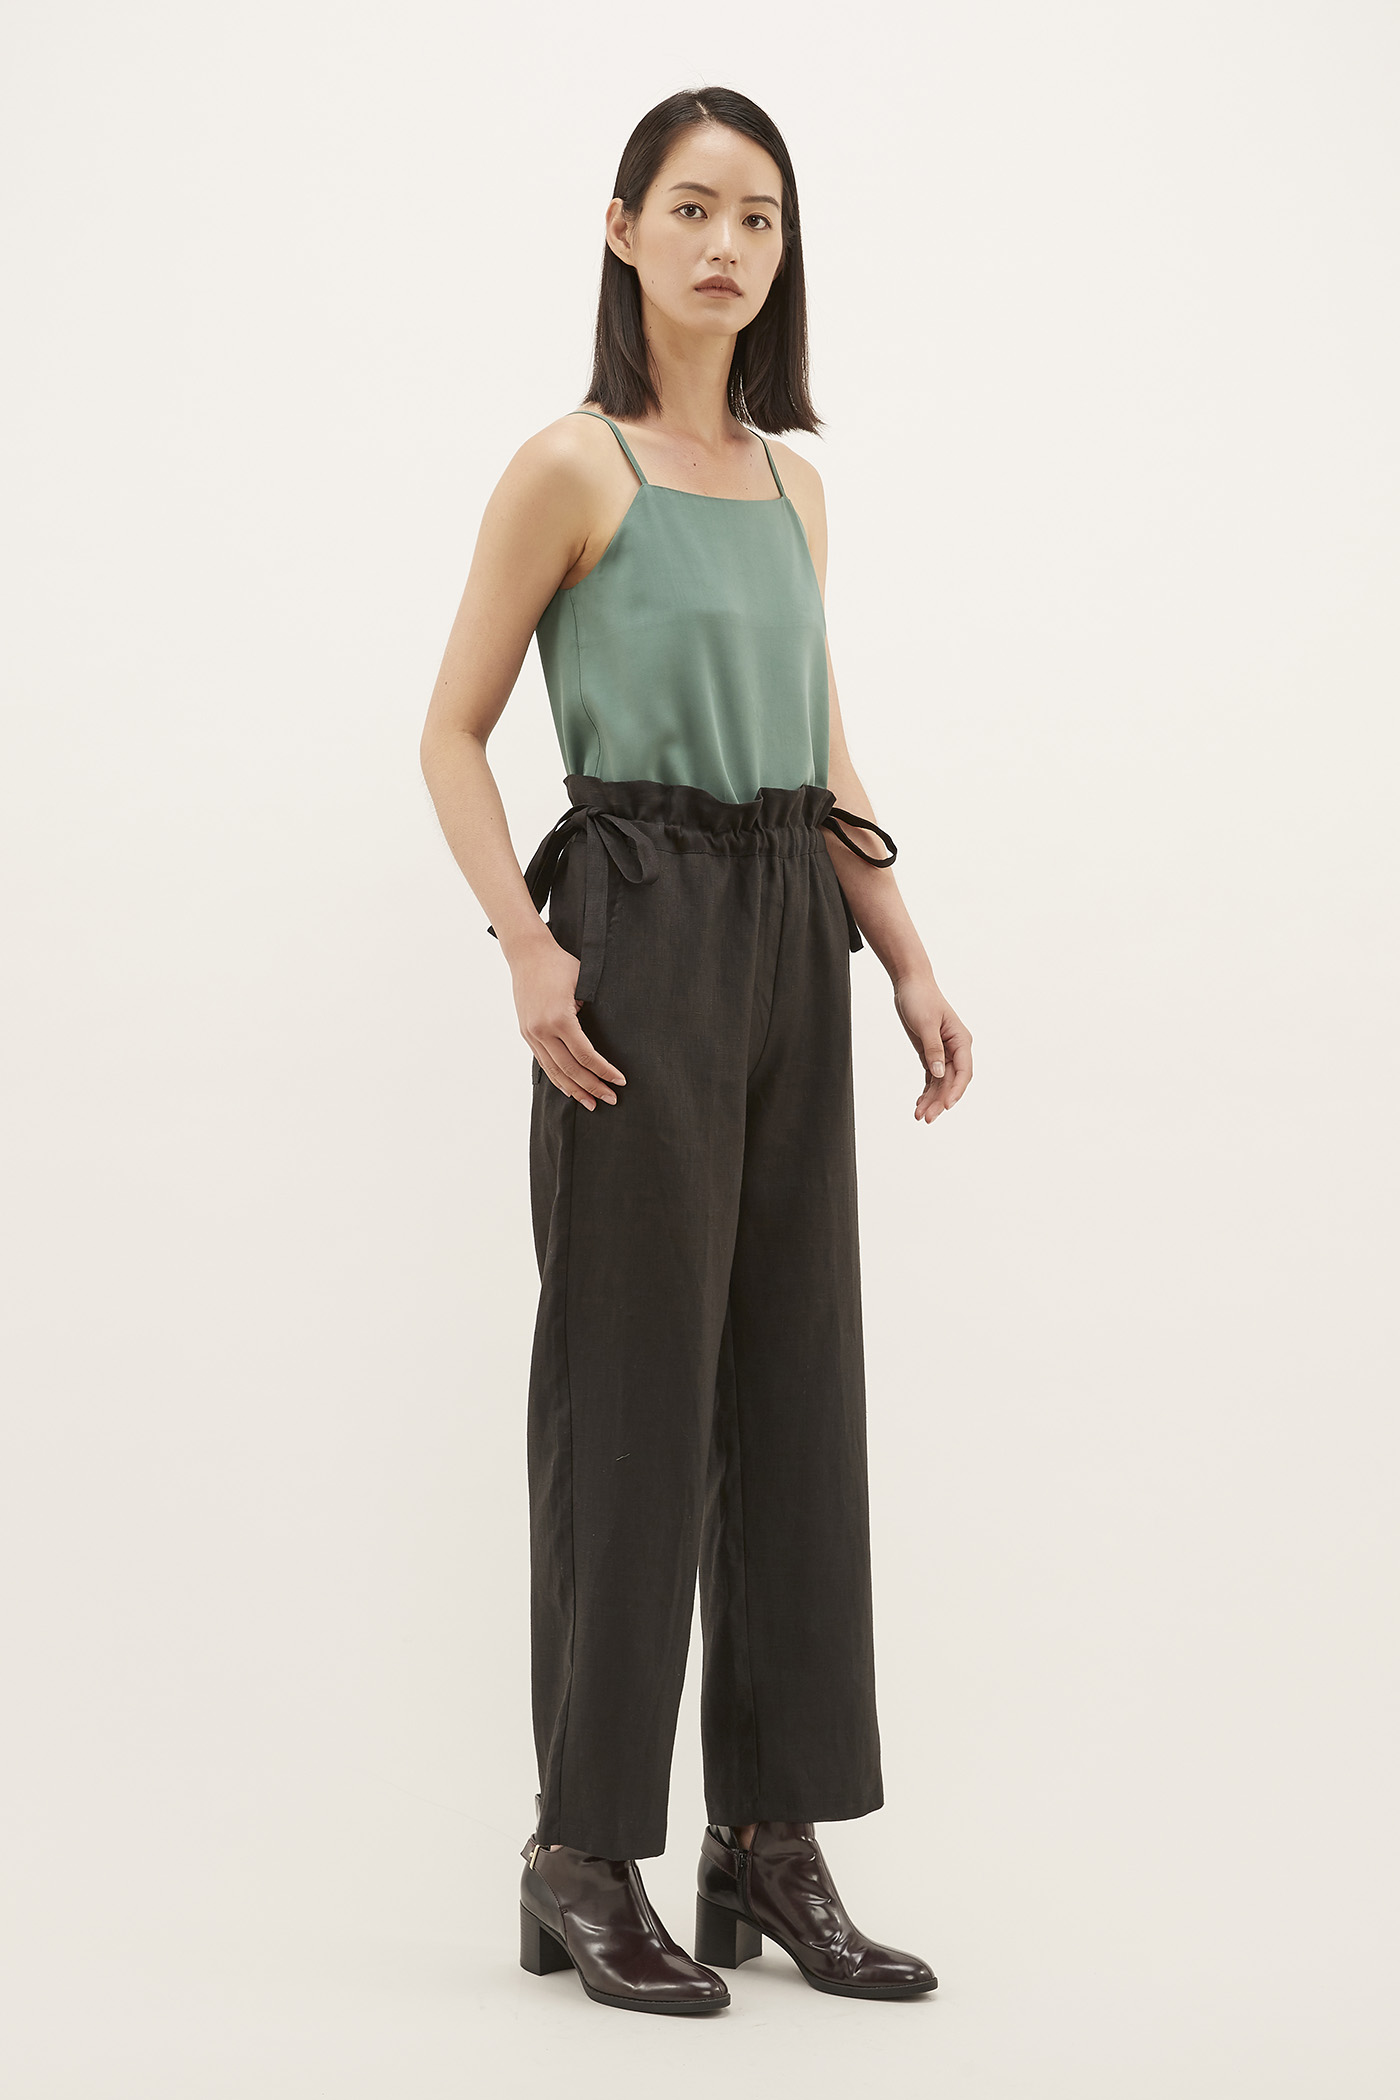 Danyale Drawstring Pants